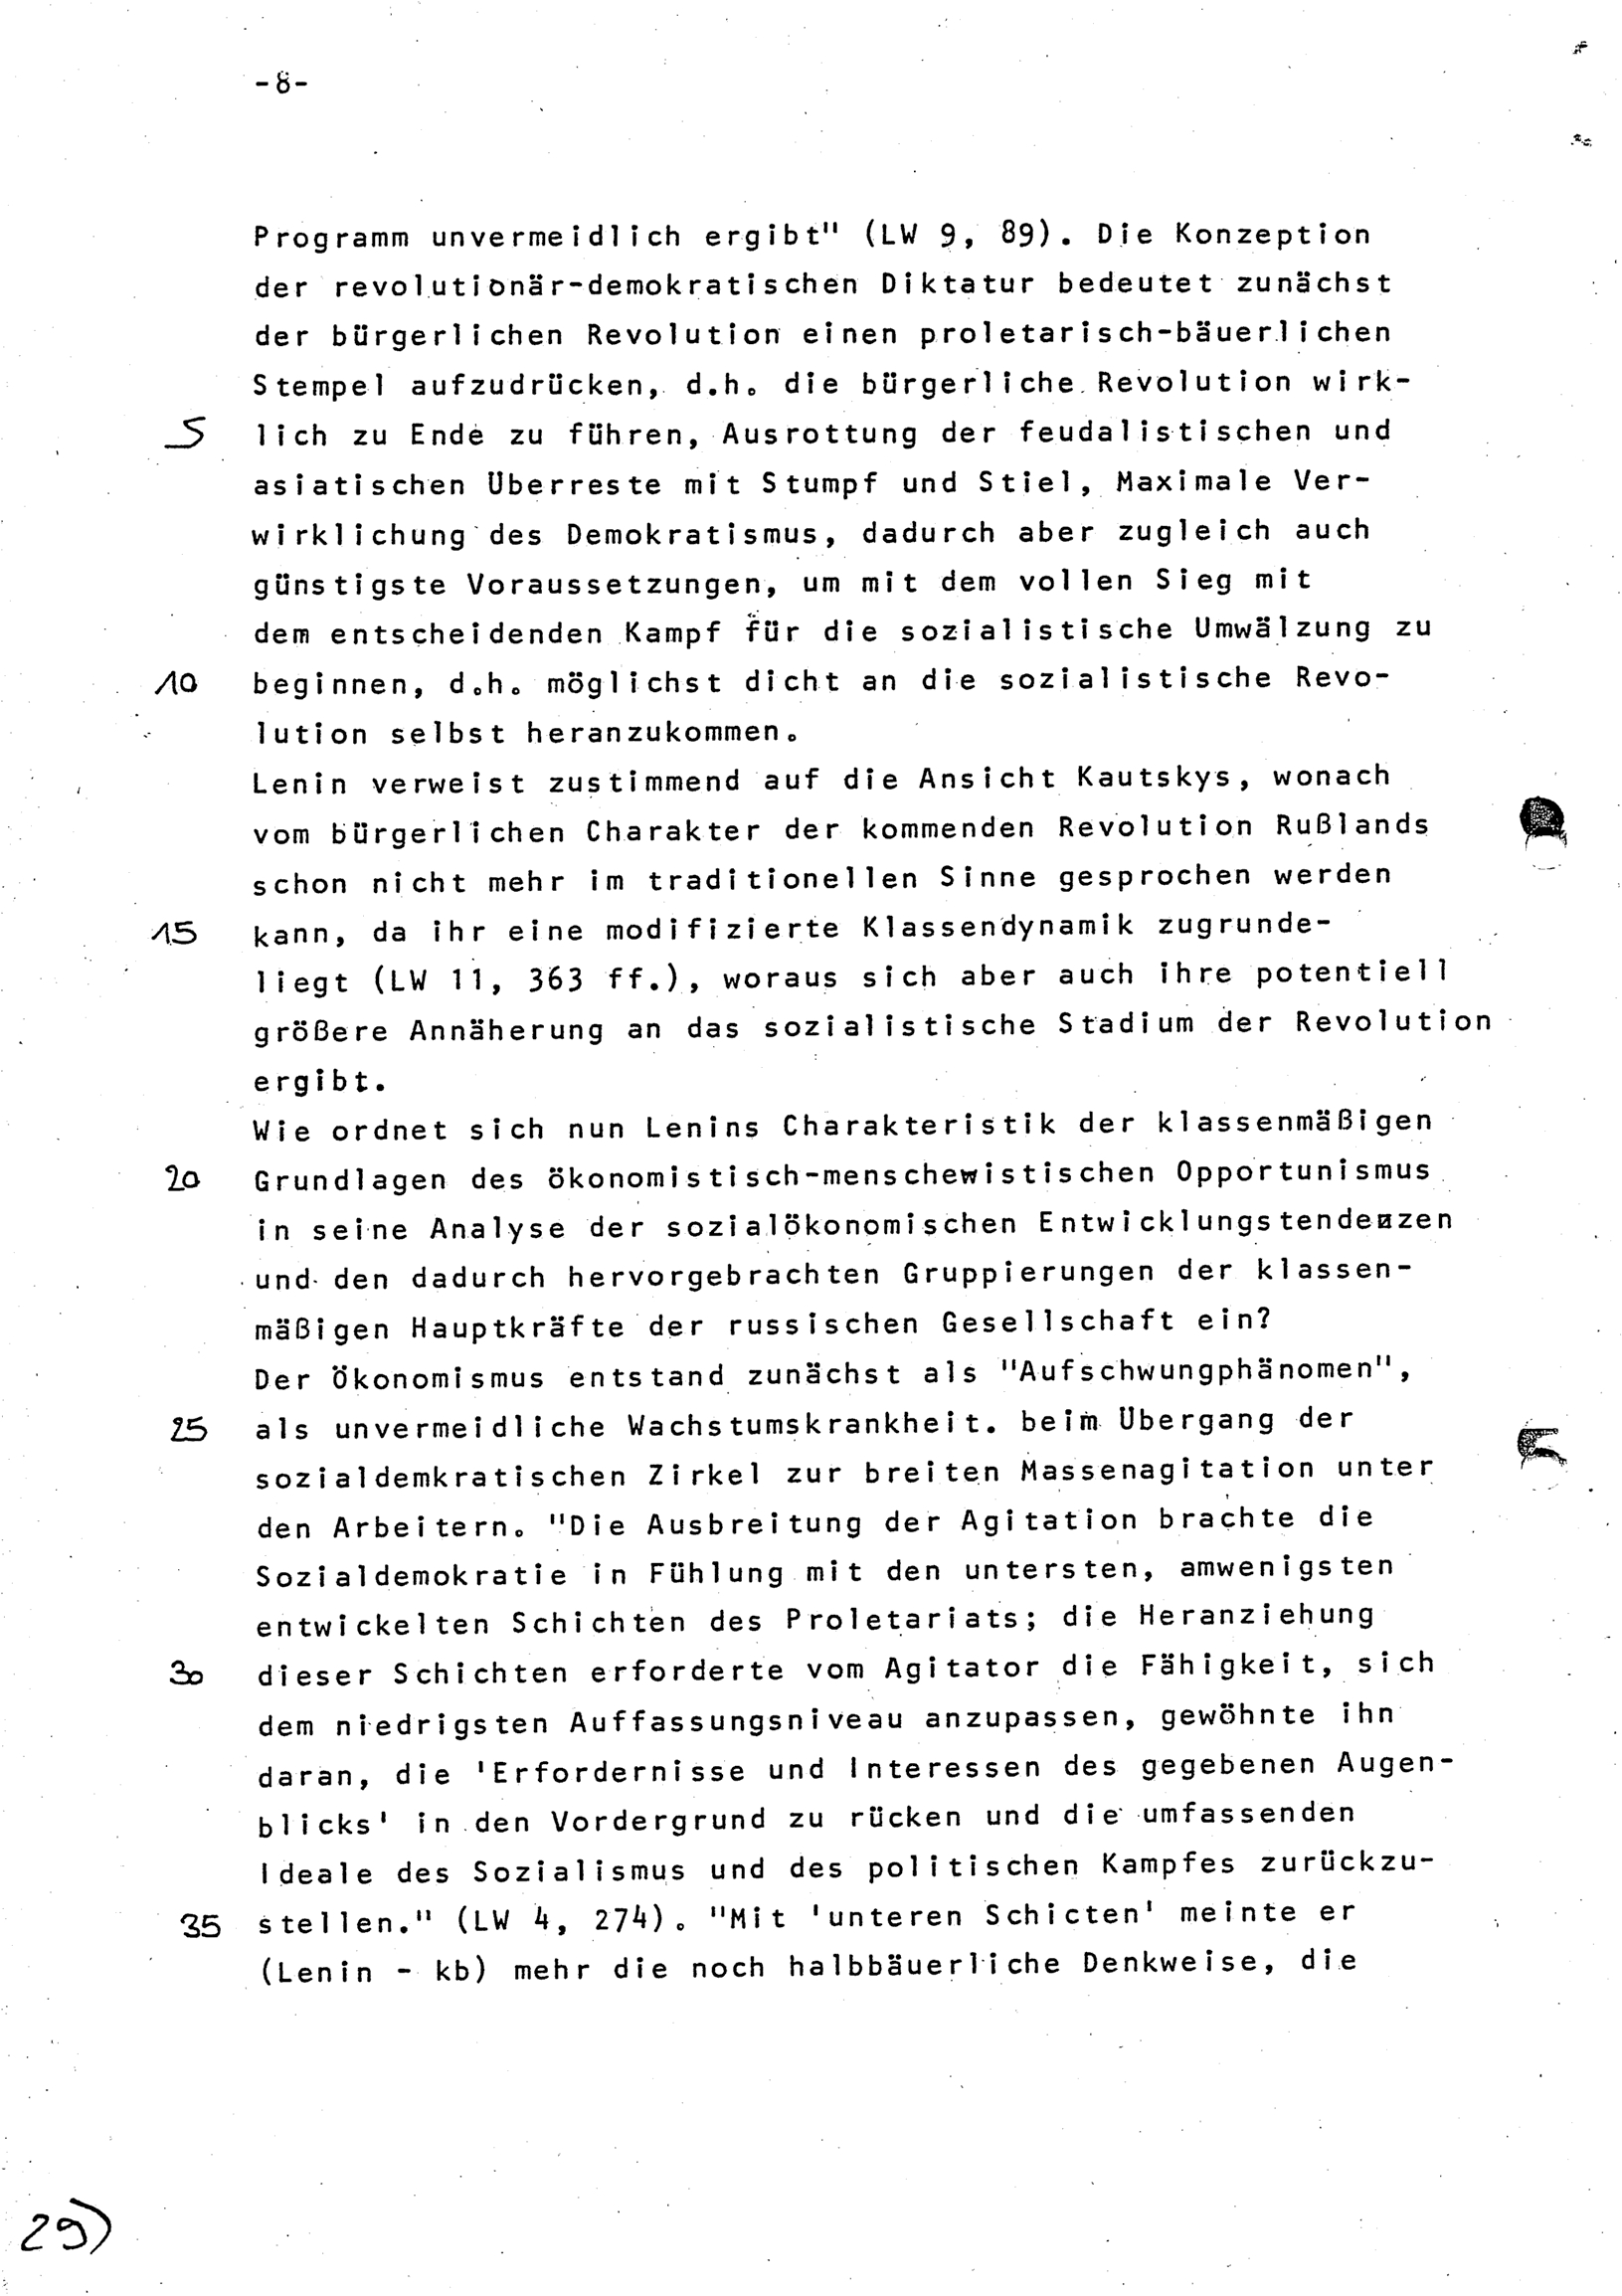 Ulm_KGU_Arbeitsheft_19830425_015_032